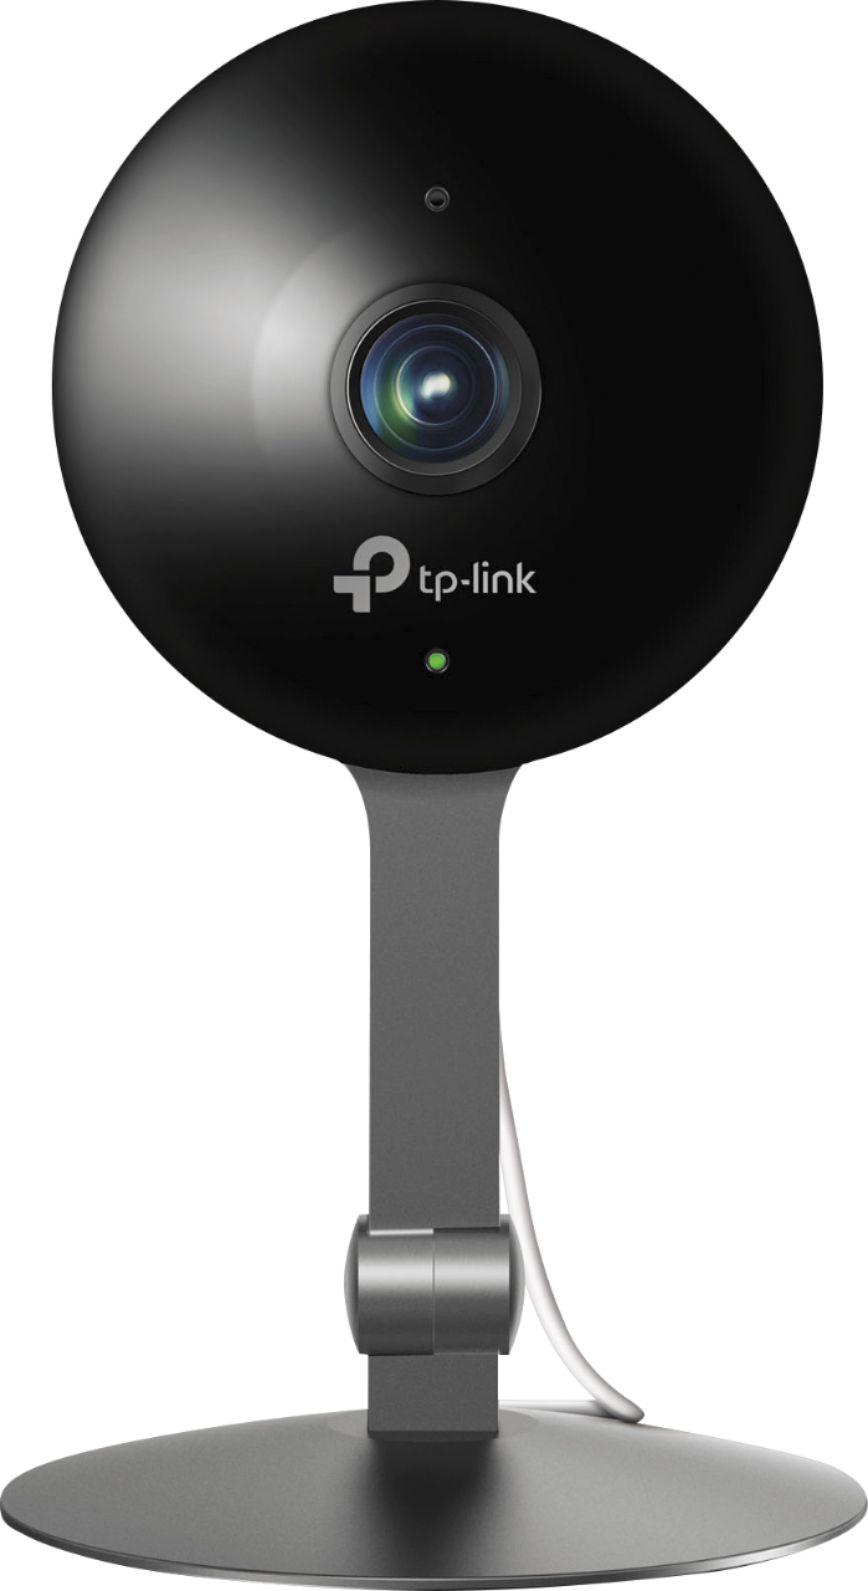 Best Buy : TP-Link - Kasa Cam Indoor Full HD Wi-Fi Security Camera - Black $39.99